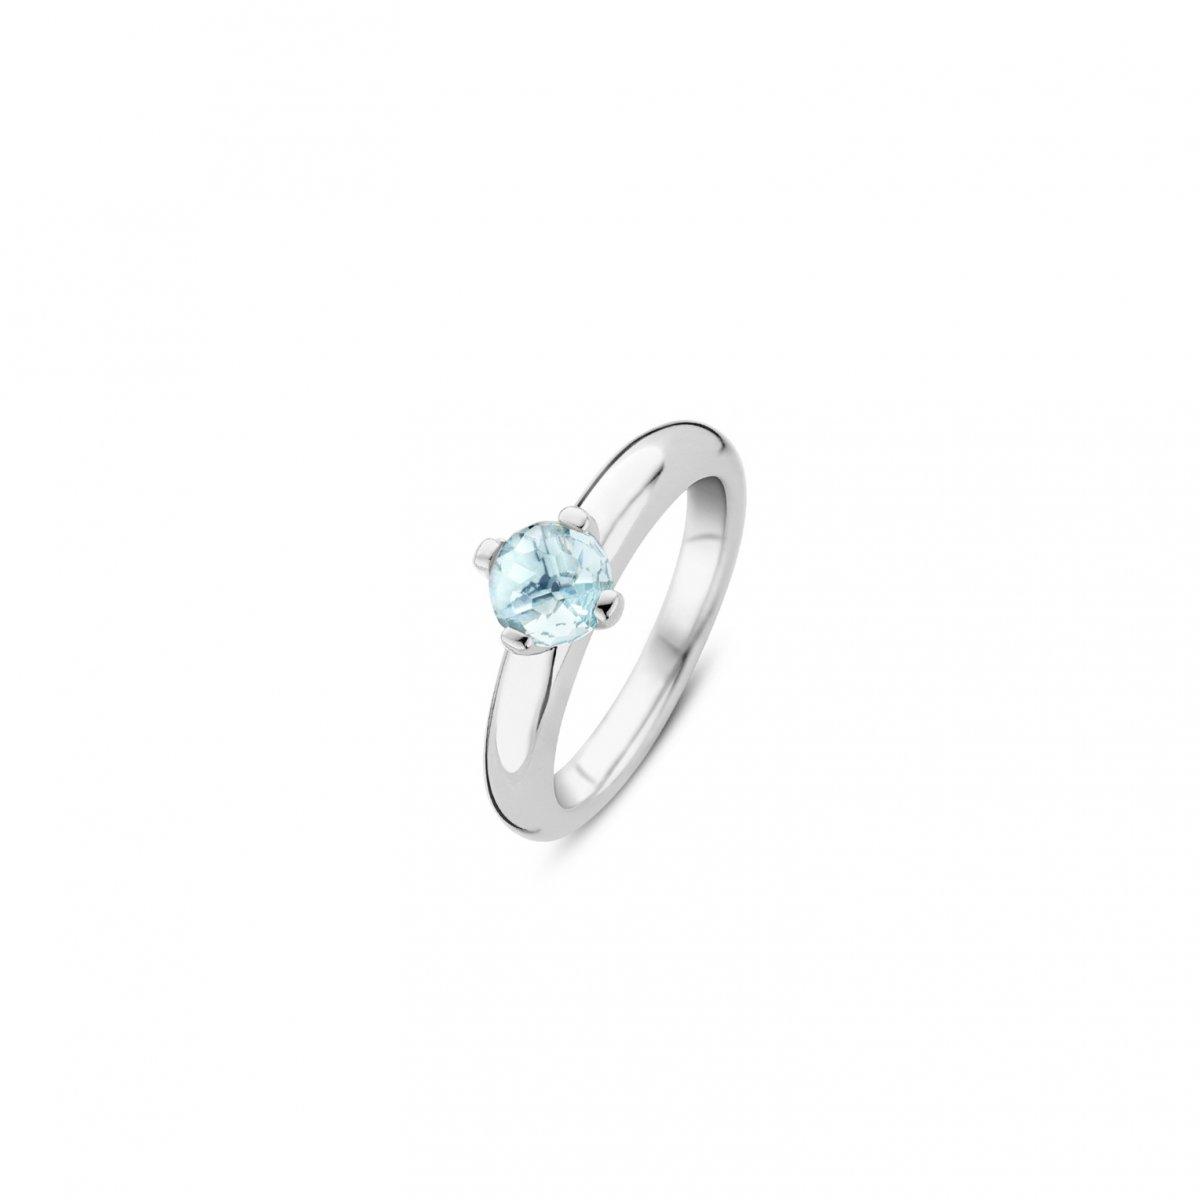 Prsteň TI SENTO s modrým syntetickým kameňom